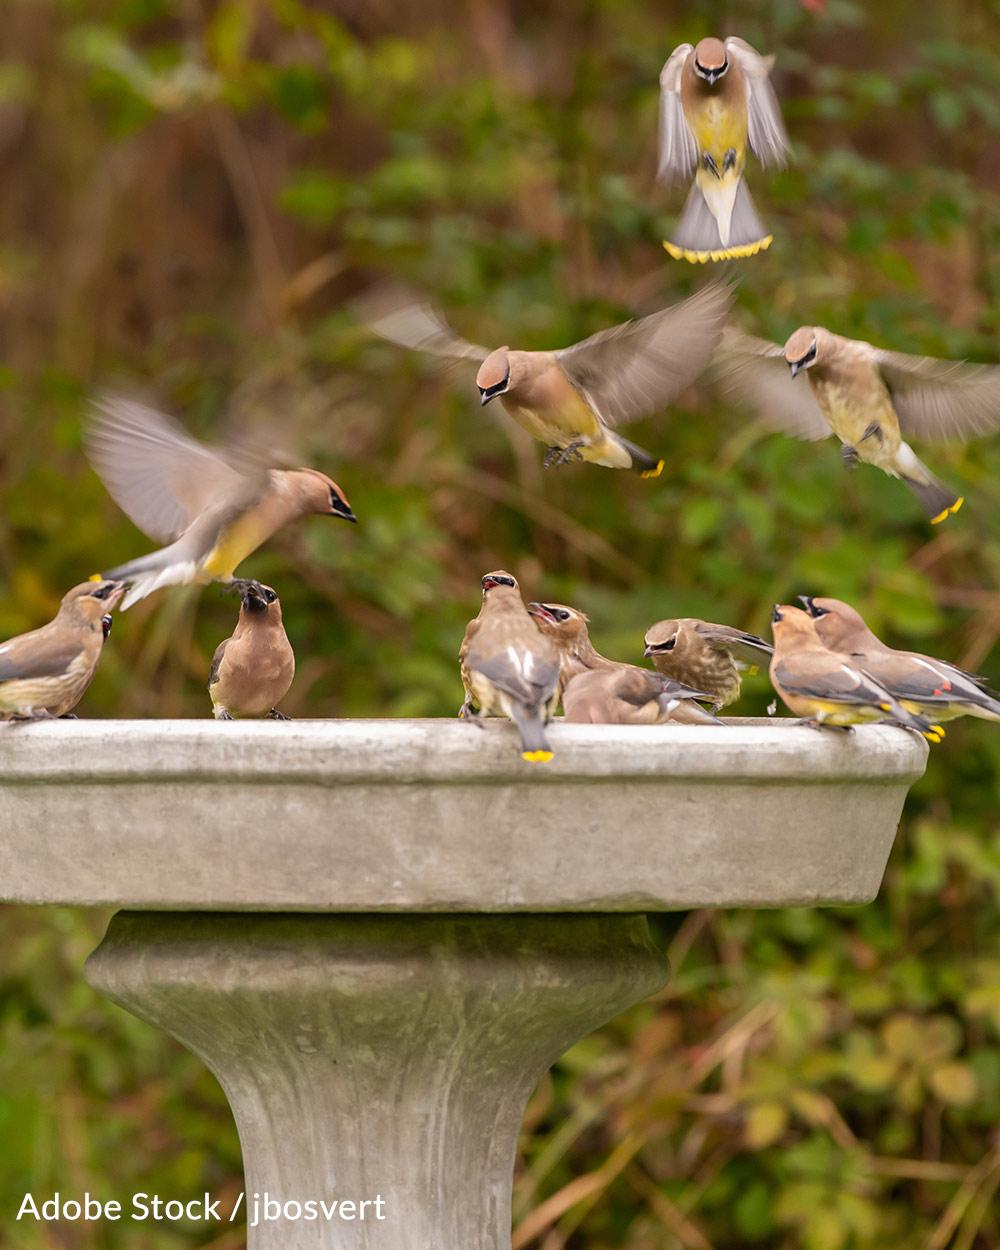 Officials urge bird watchers to keep birdbaths clean, or remove them.